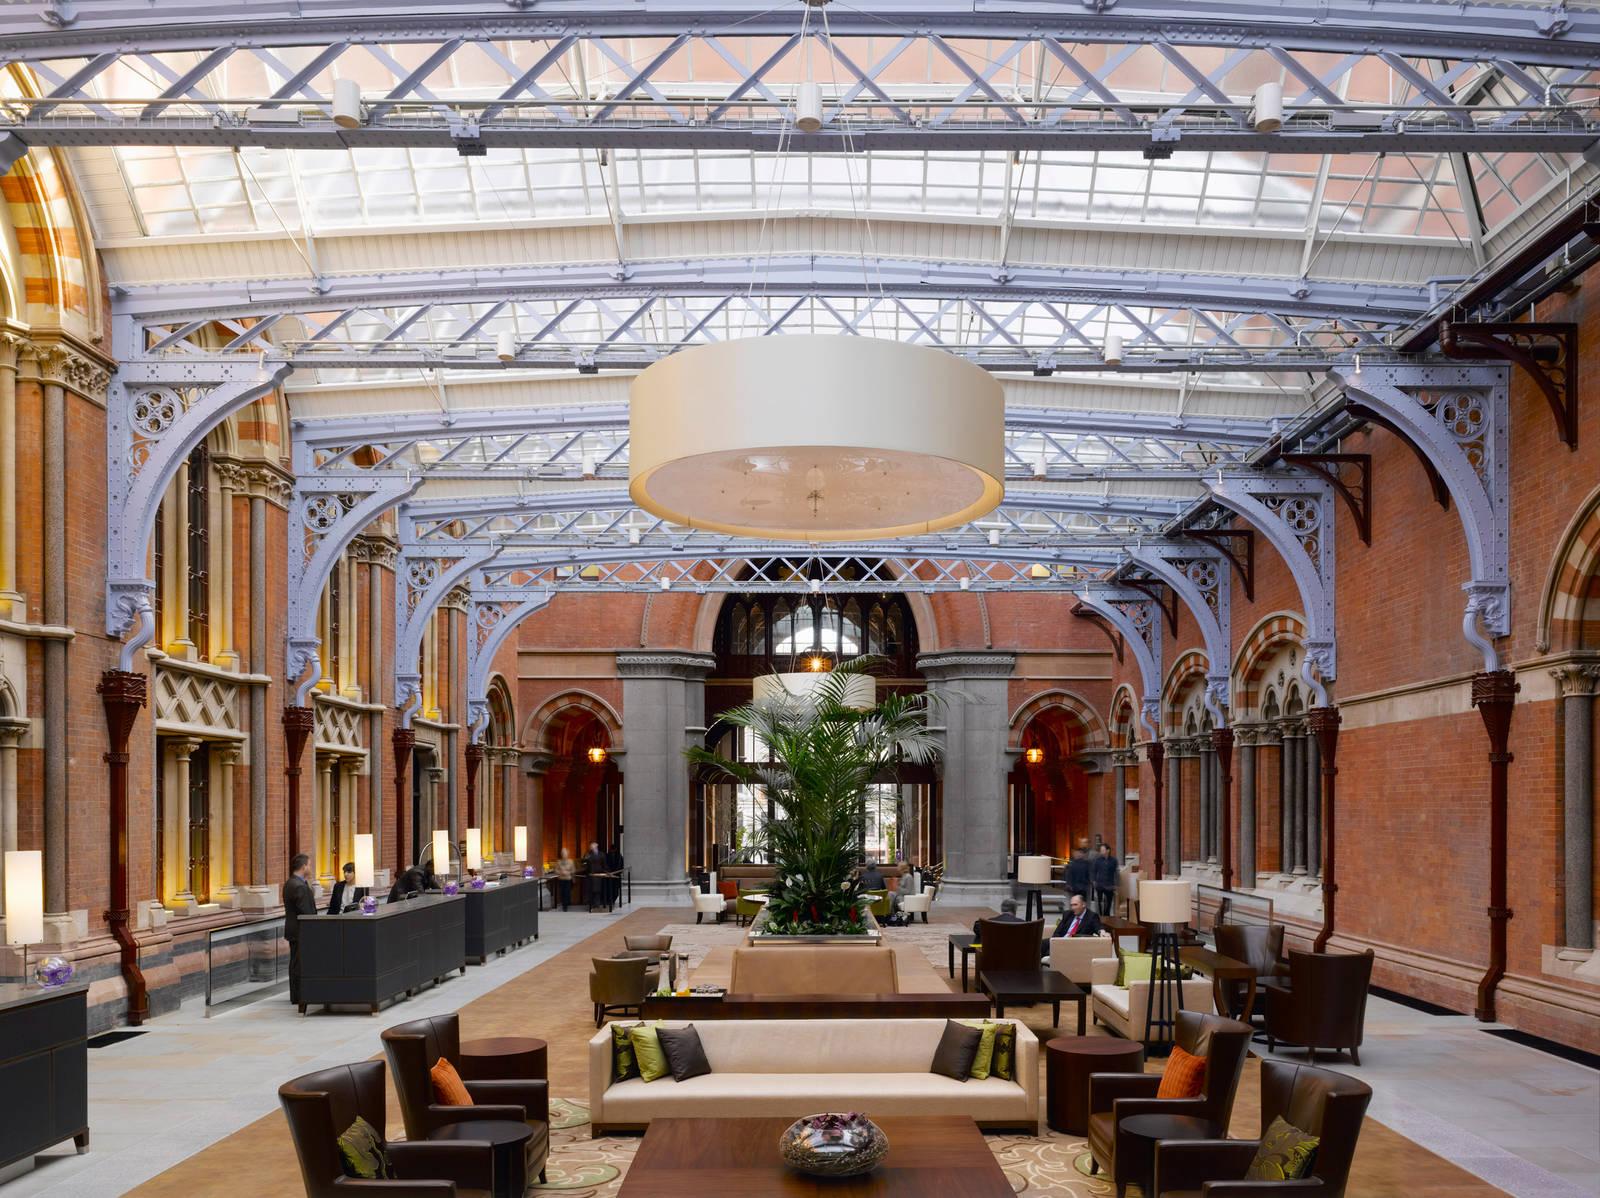 St Pancras Renaissance Hotel 09